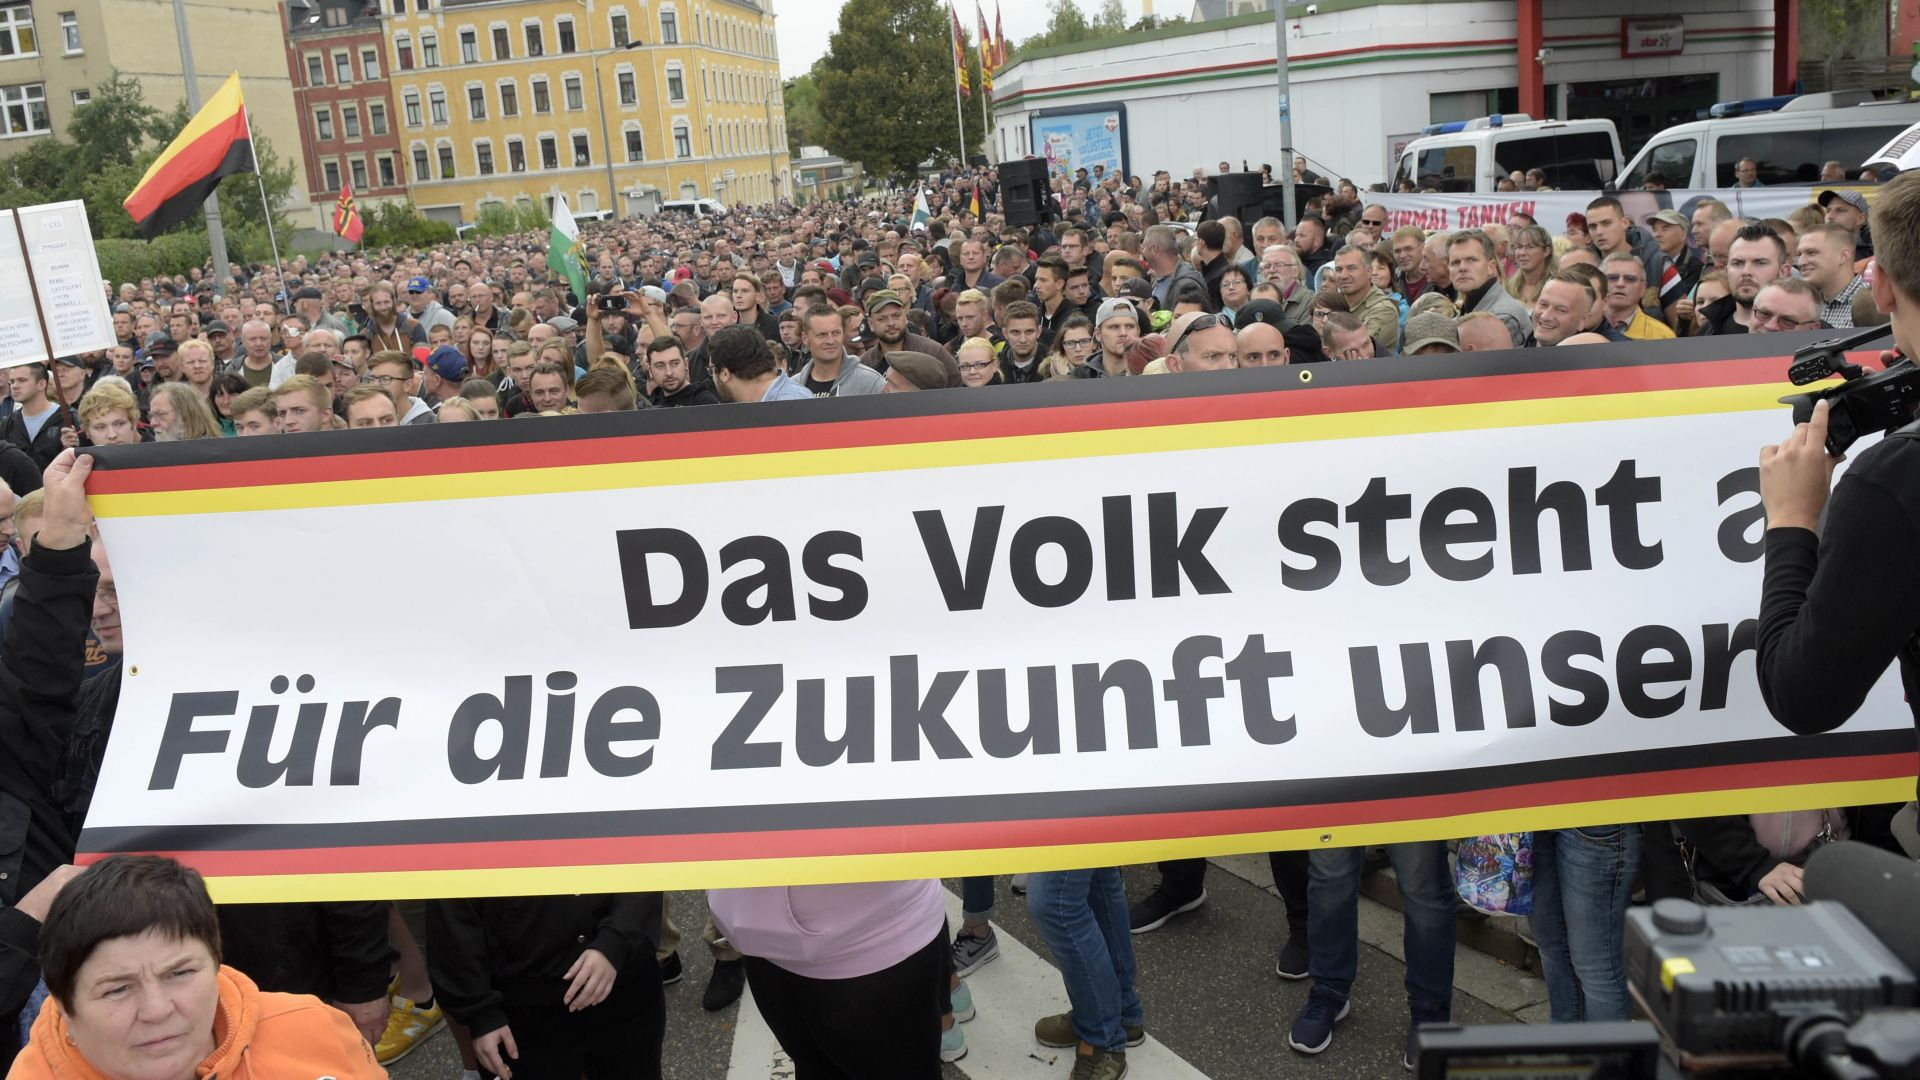 Пак напрежение в Кемниц - над 1000 десни екстремисти на протест (снимки)